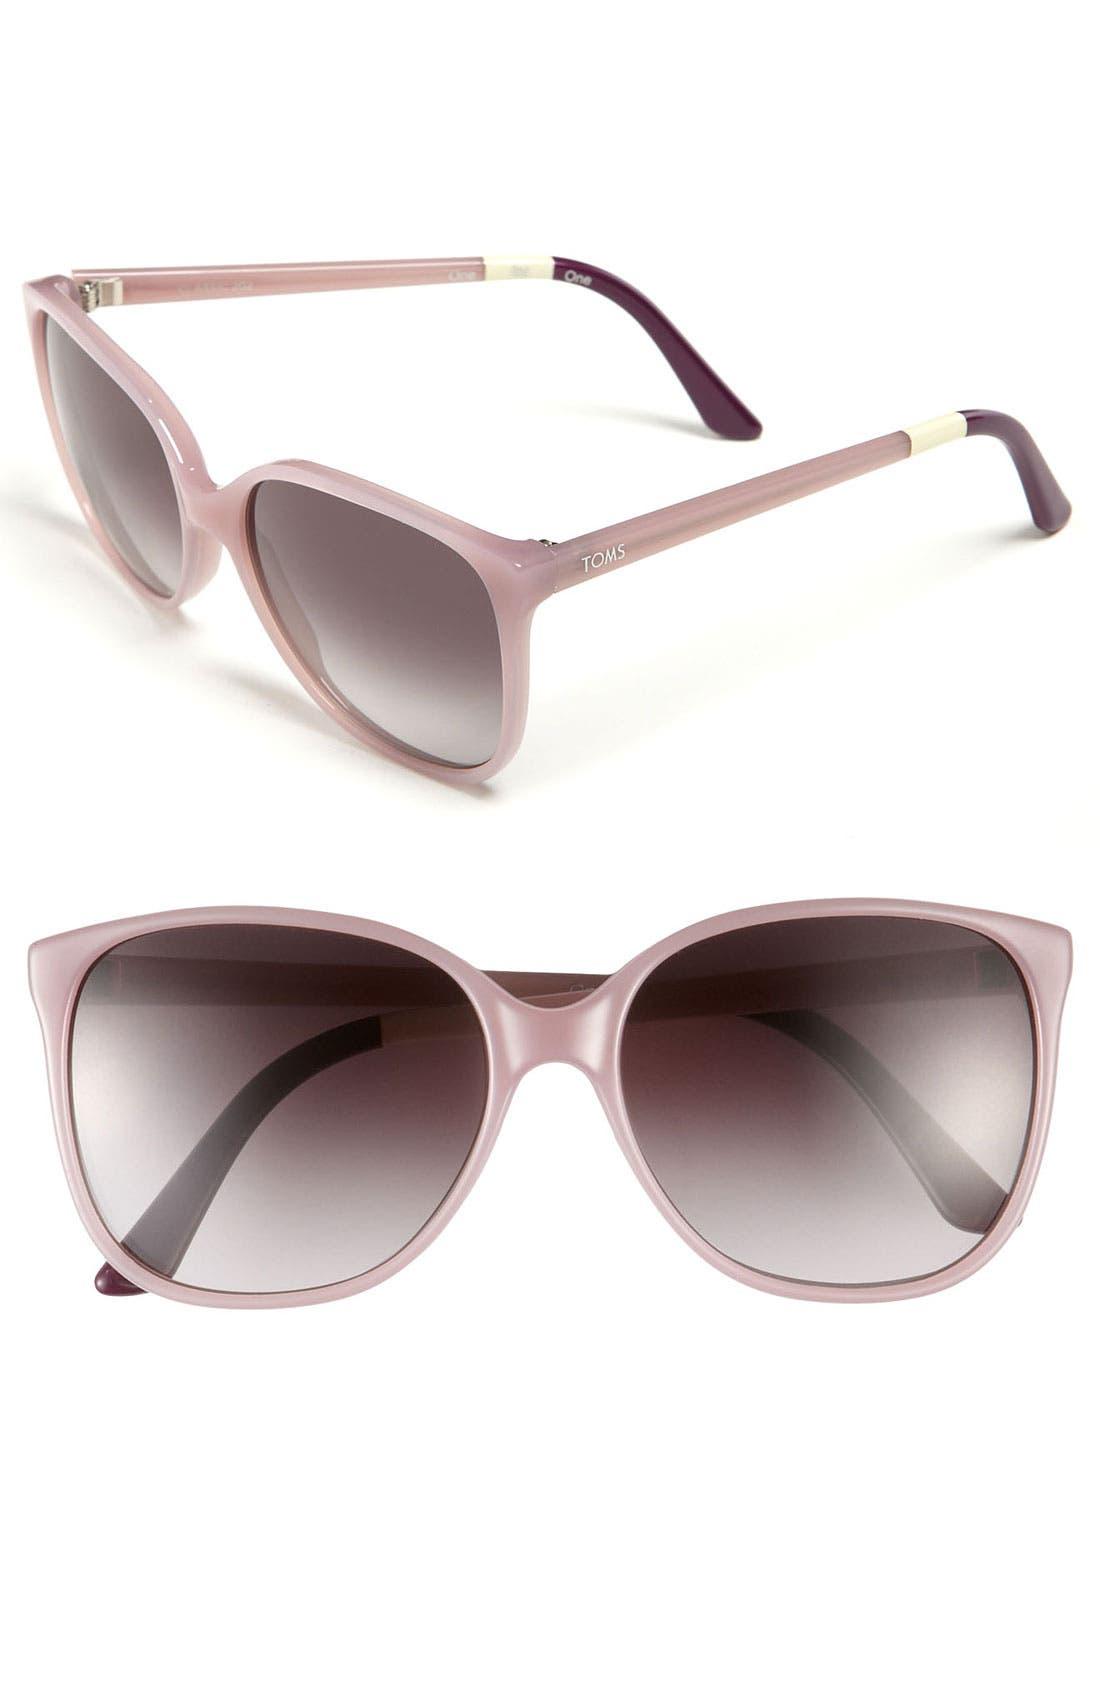 Main Image - TOMS 'Sandela' 57mm Sunglasses